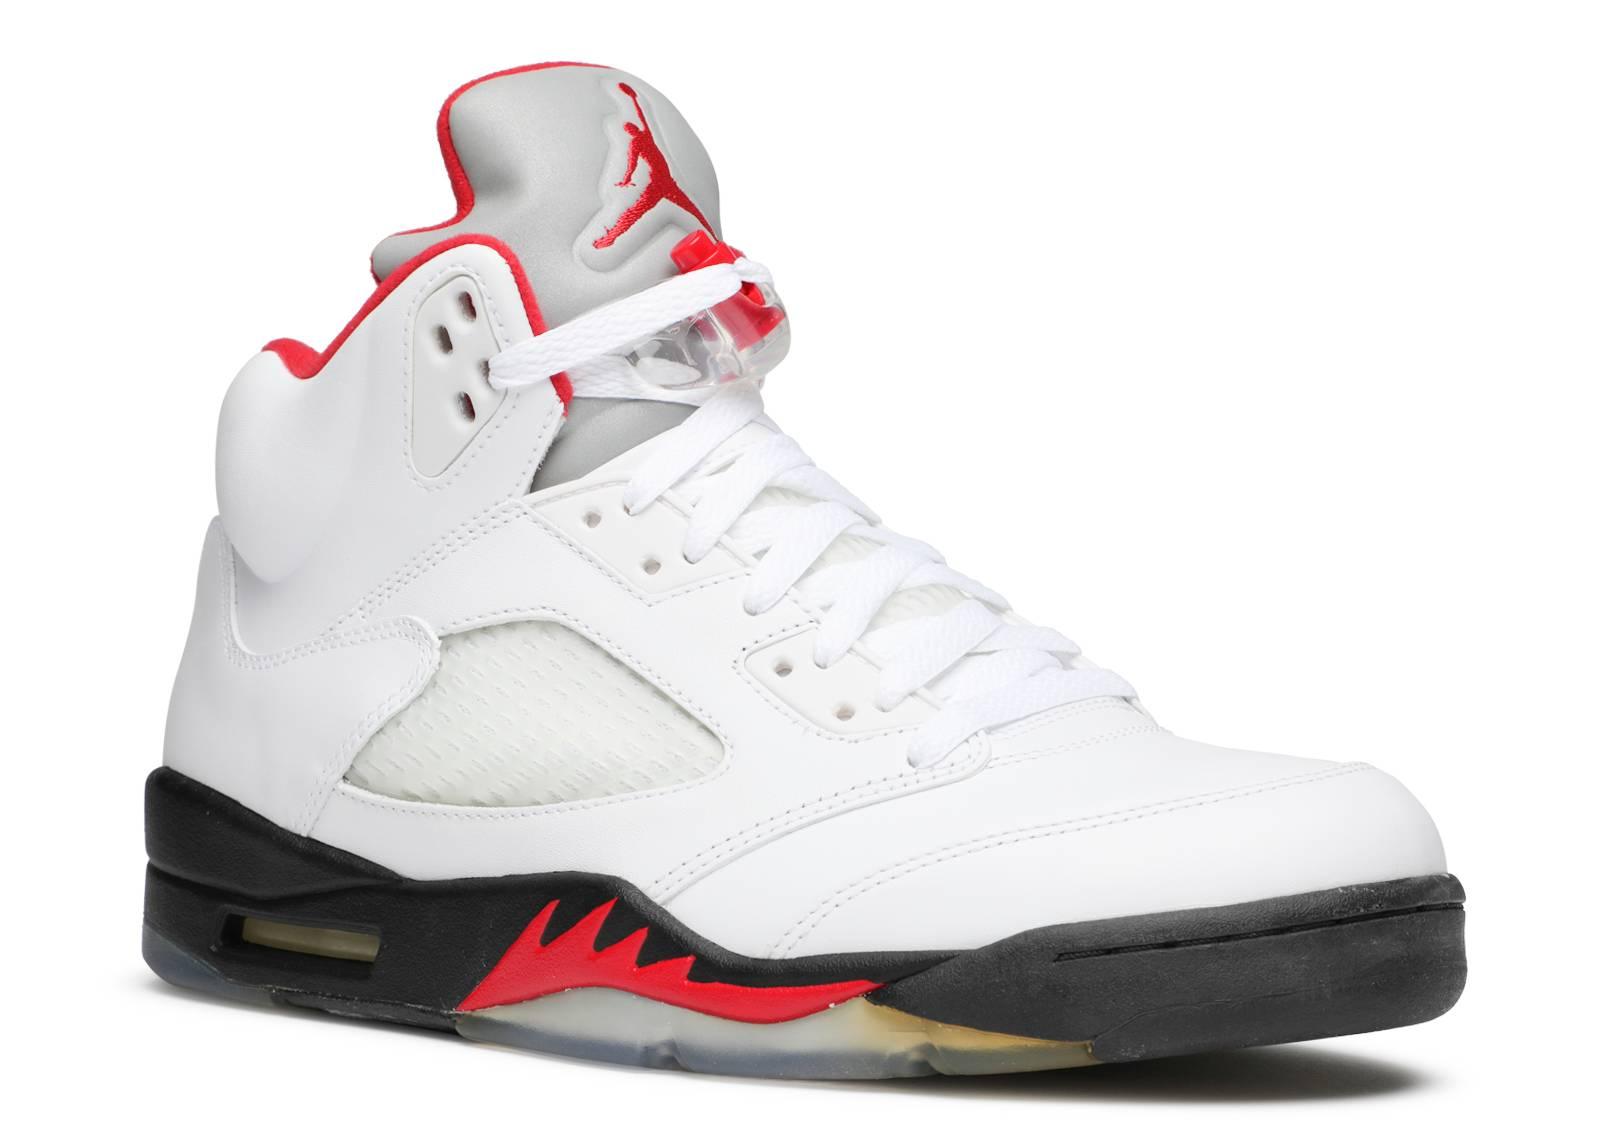 dbf7428f20e0 Air Jordan 5 Retro